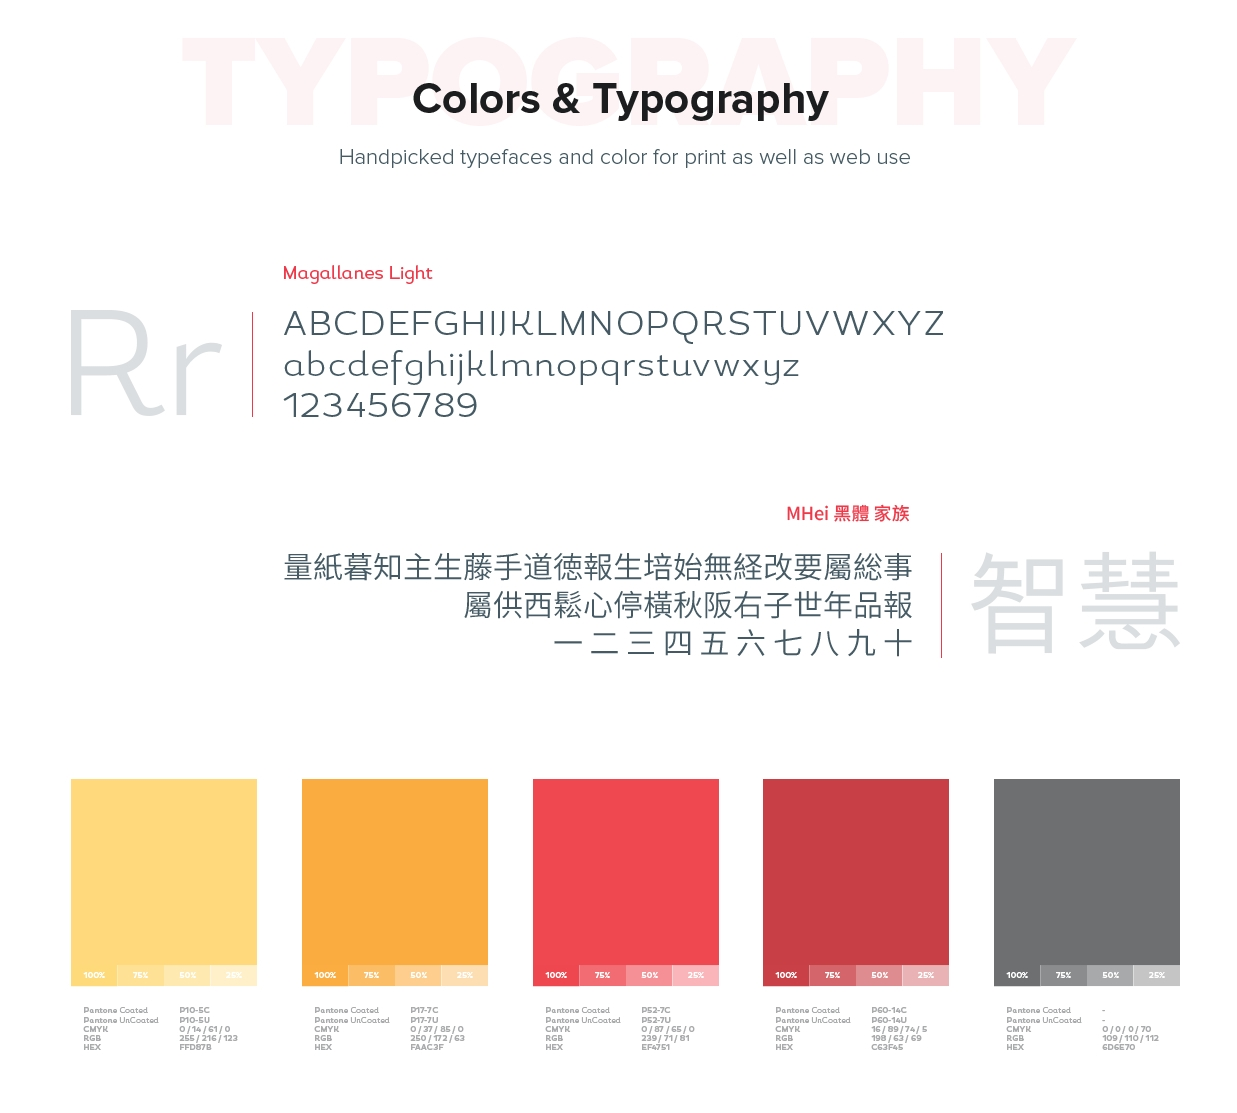 https://media.authentic-studio.com/web-content/uploads/2020/11/logo-and-responsive-web-design-for-smart-rocket-example-3.jpg